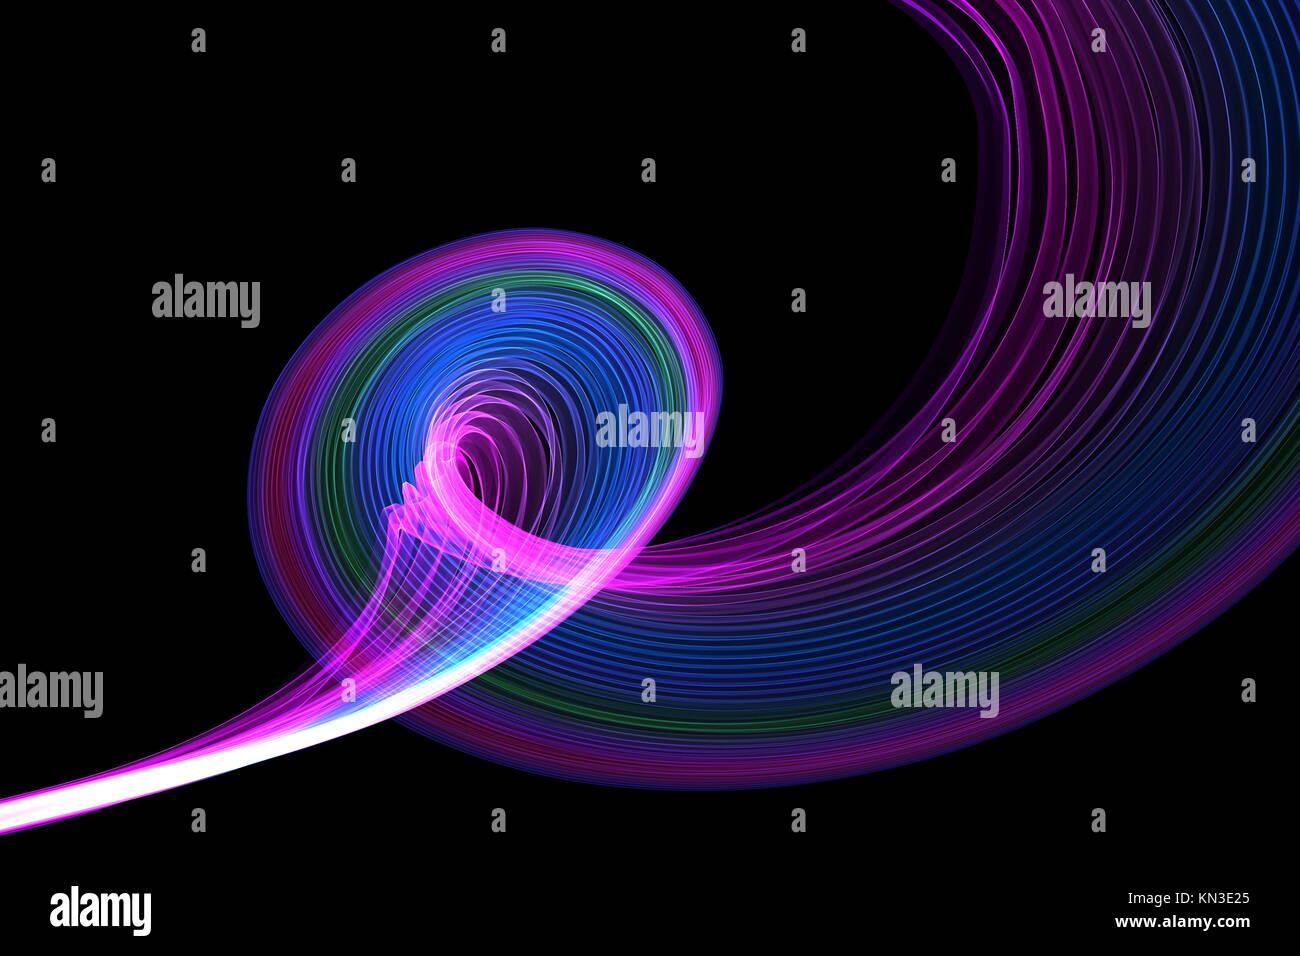 A waveform Design Element isolated on black. - Stock Image